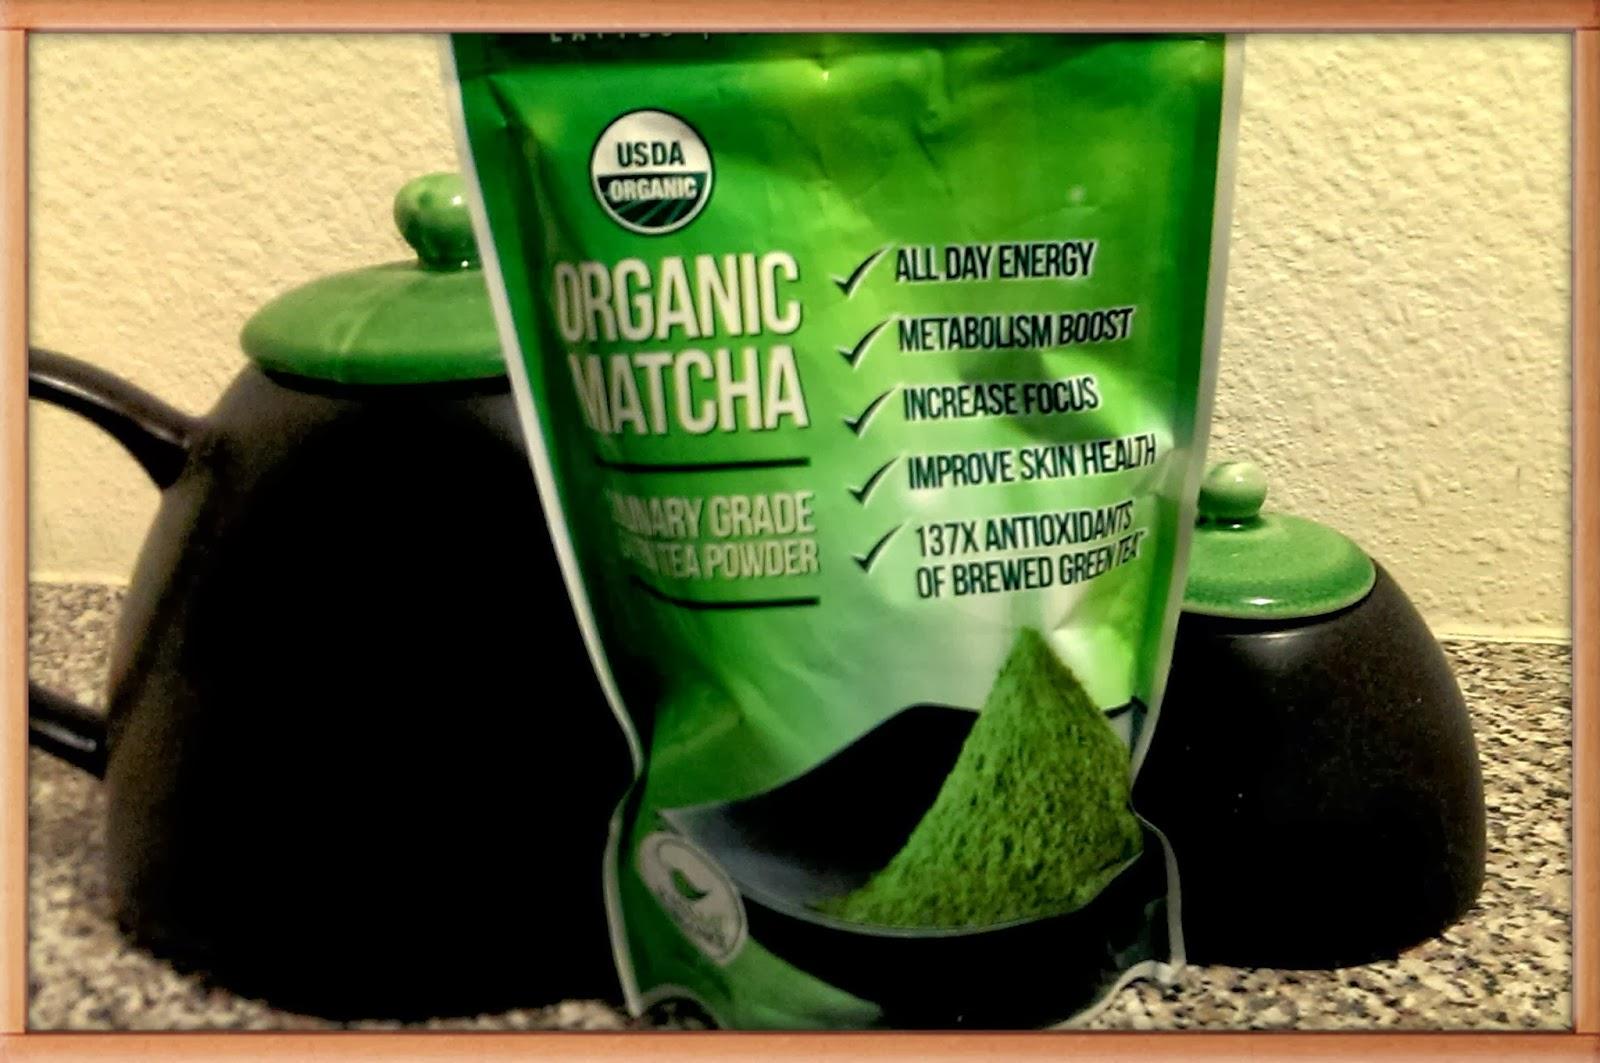 Organic+Matcha Organic Matcha-Green Tea Powder Review